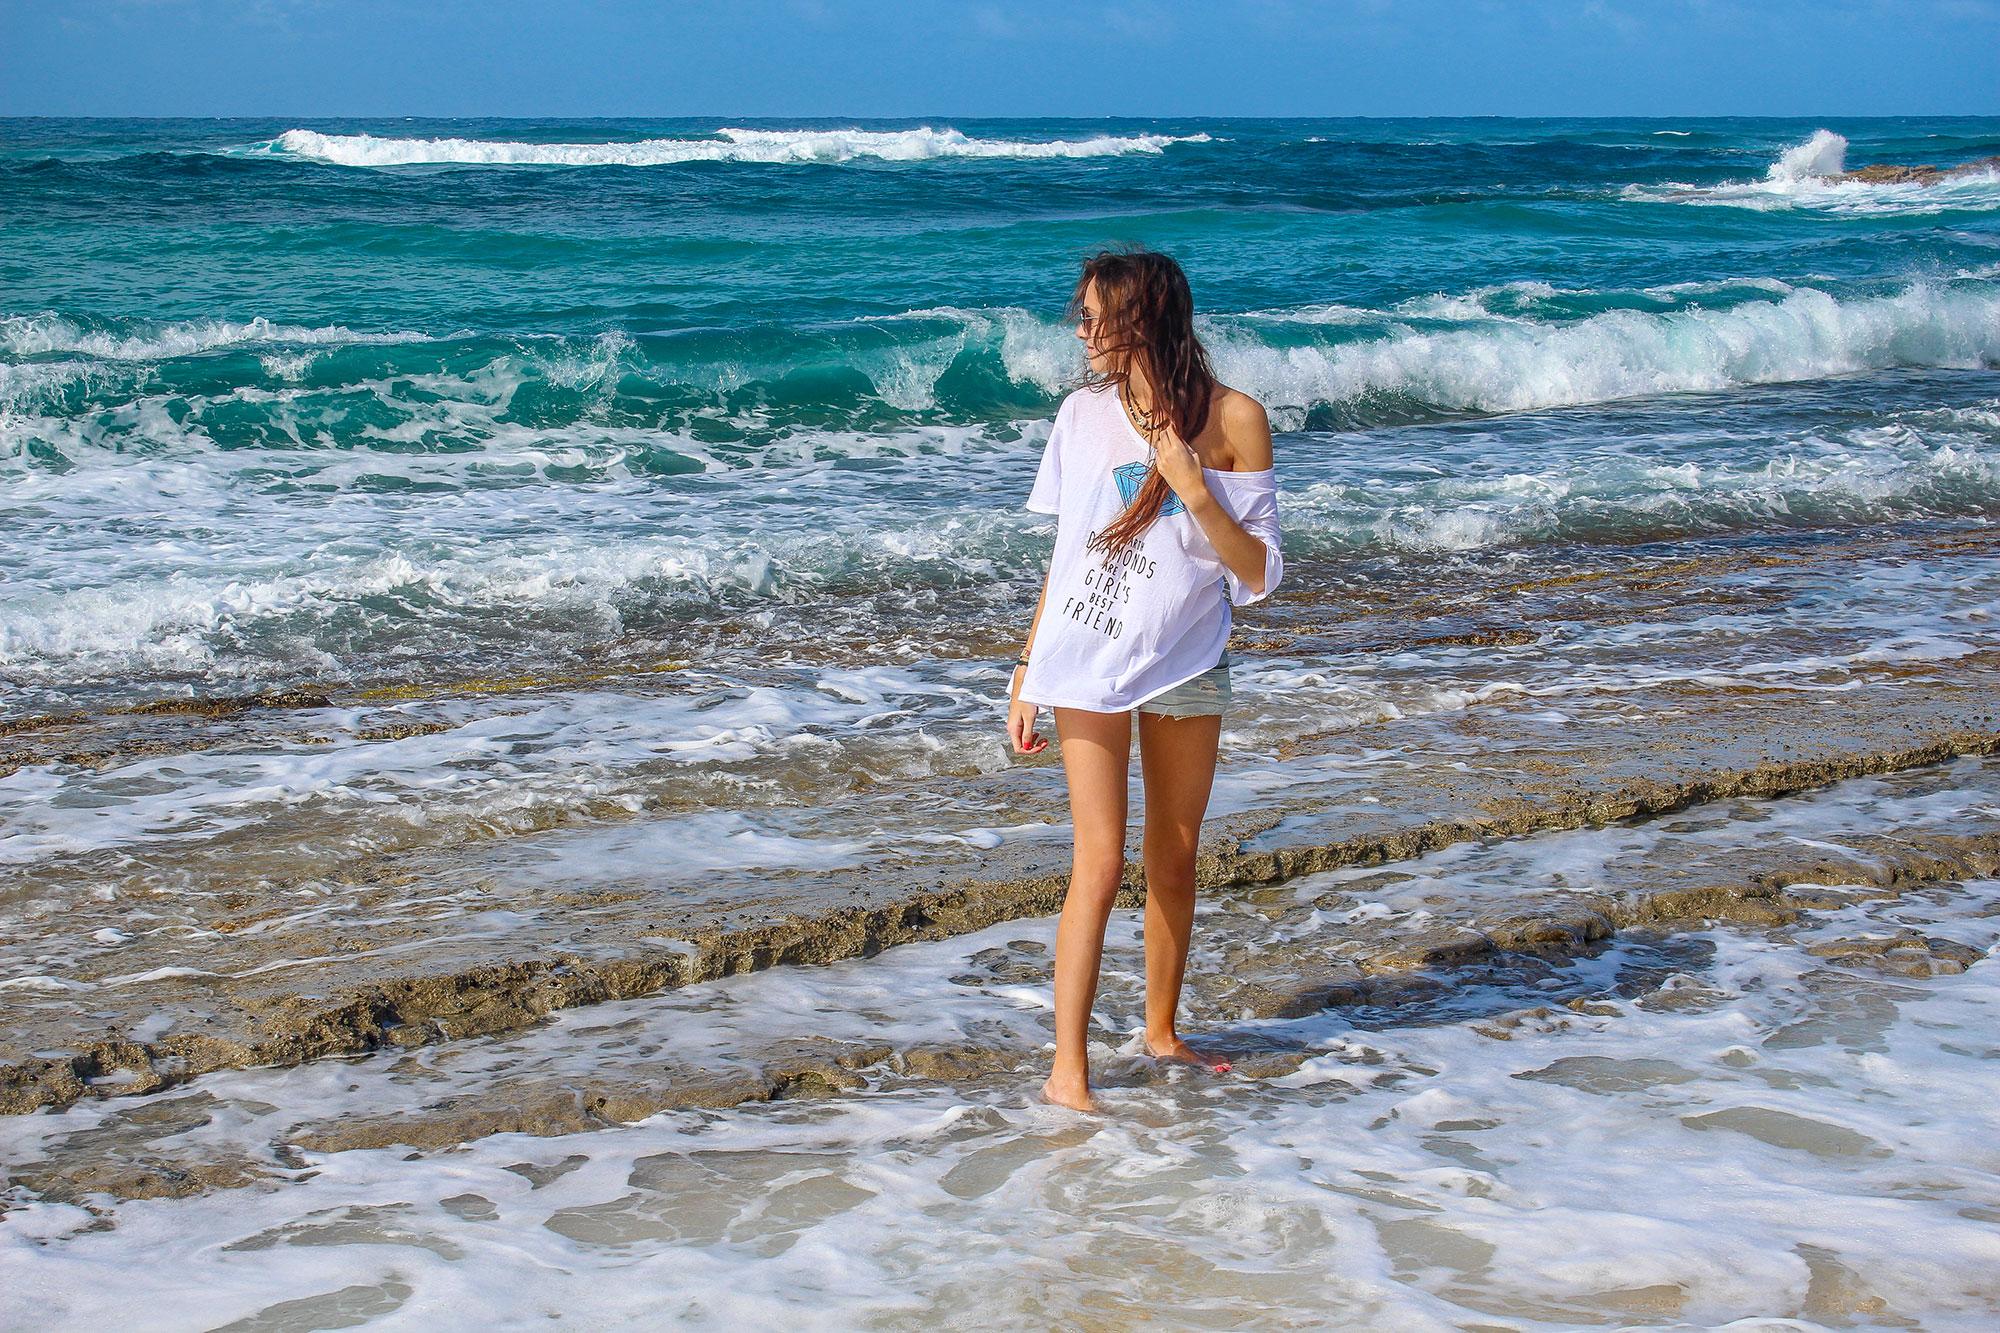 Ella by ocean on beach at Anse de Grand Cul-De-Sac in St Barthélemy